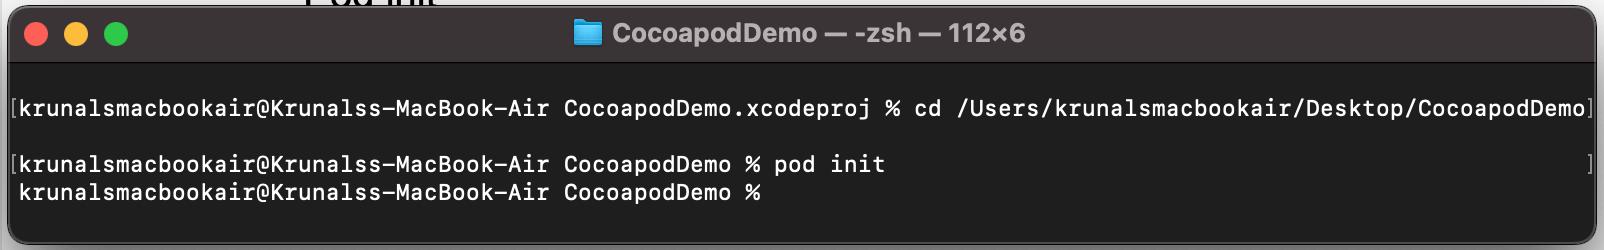 Pod init code